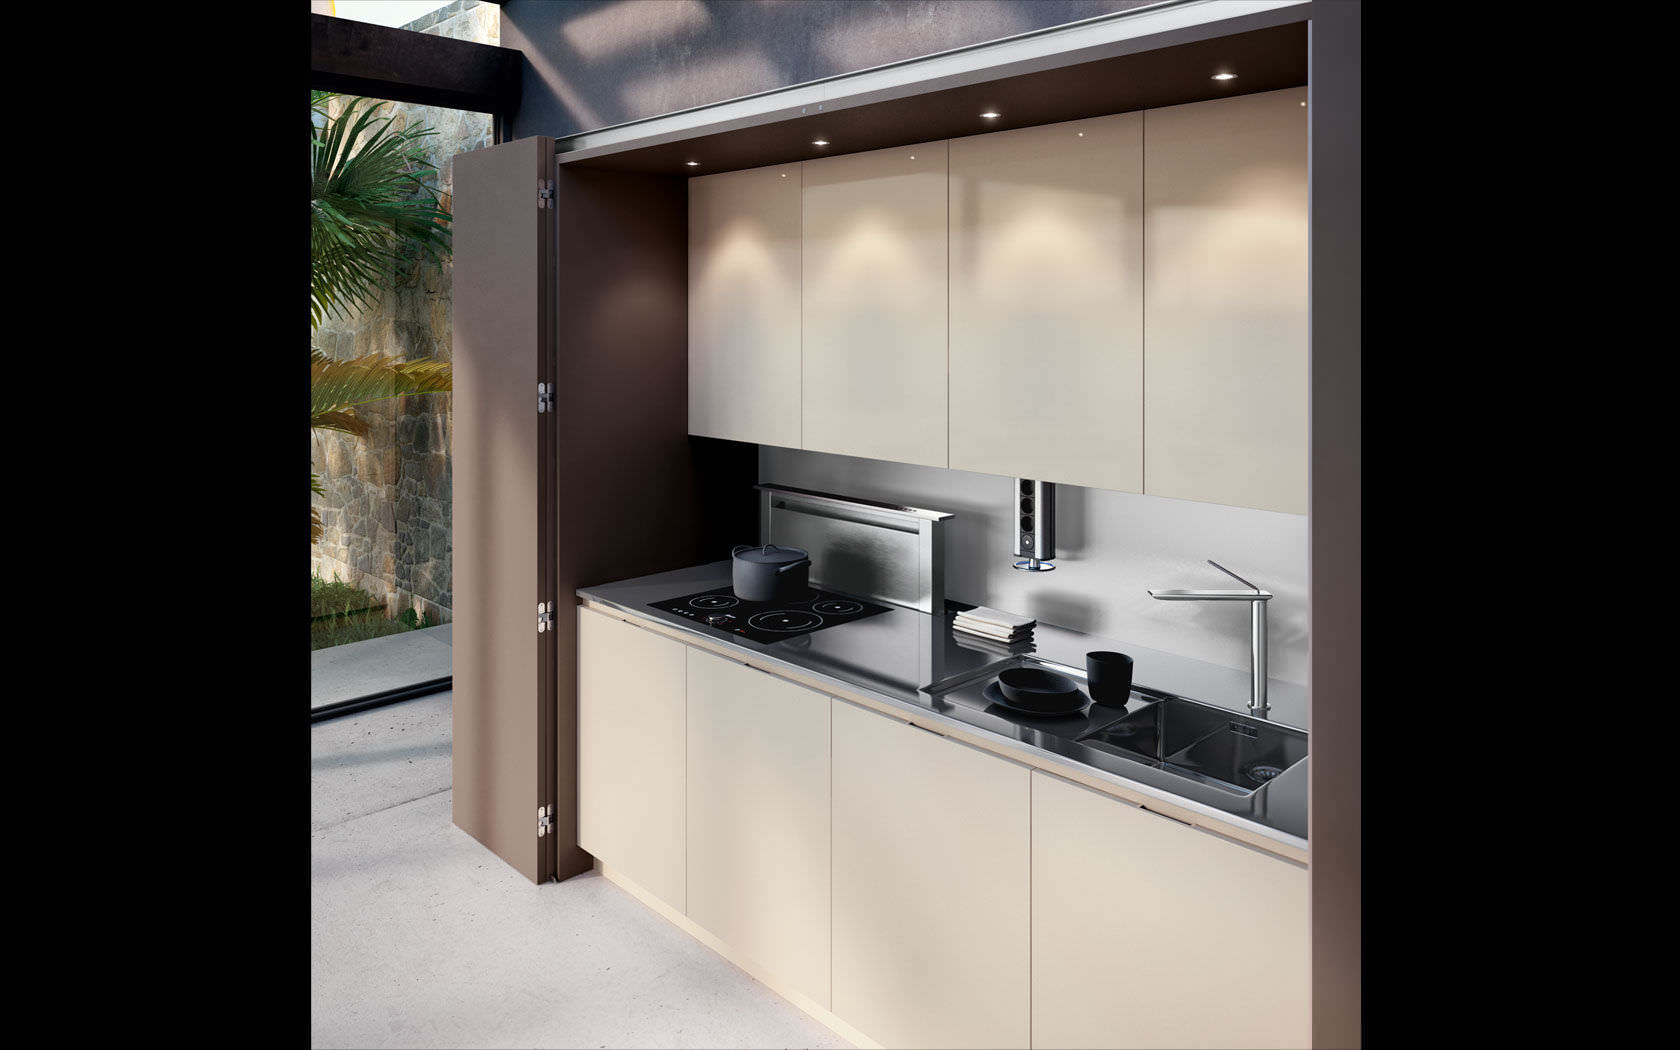 Moderne küche holz versteckte metamorphosis lineaquattro